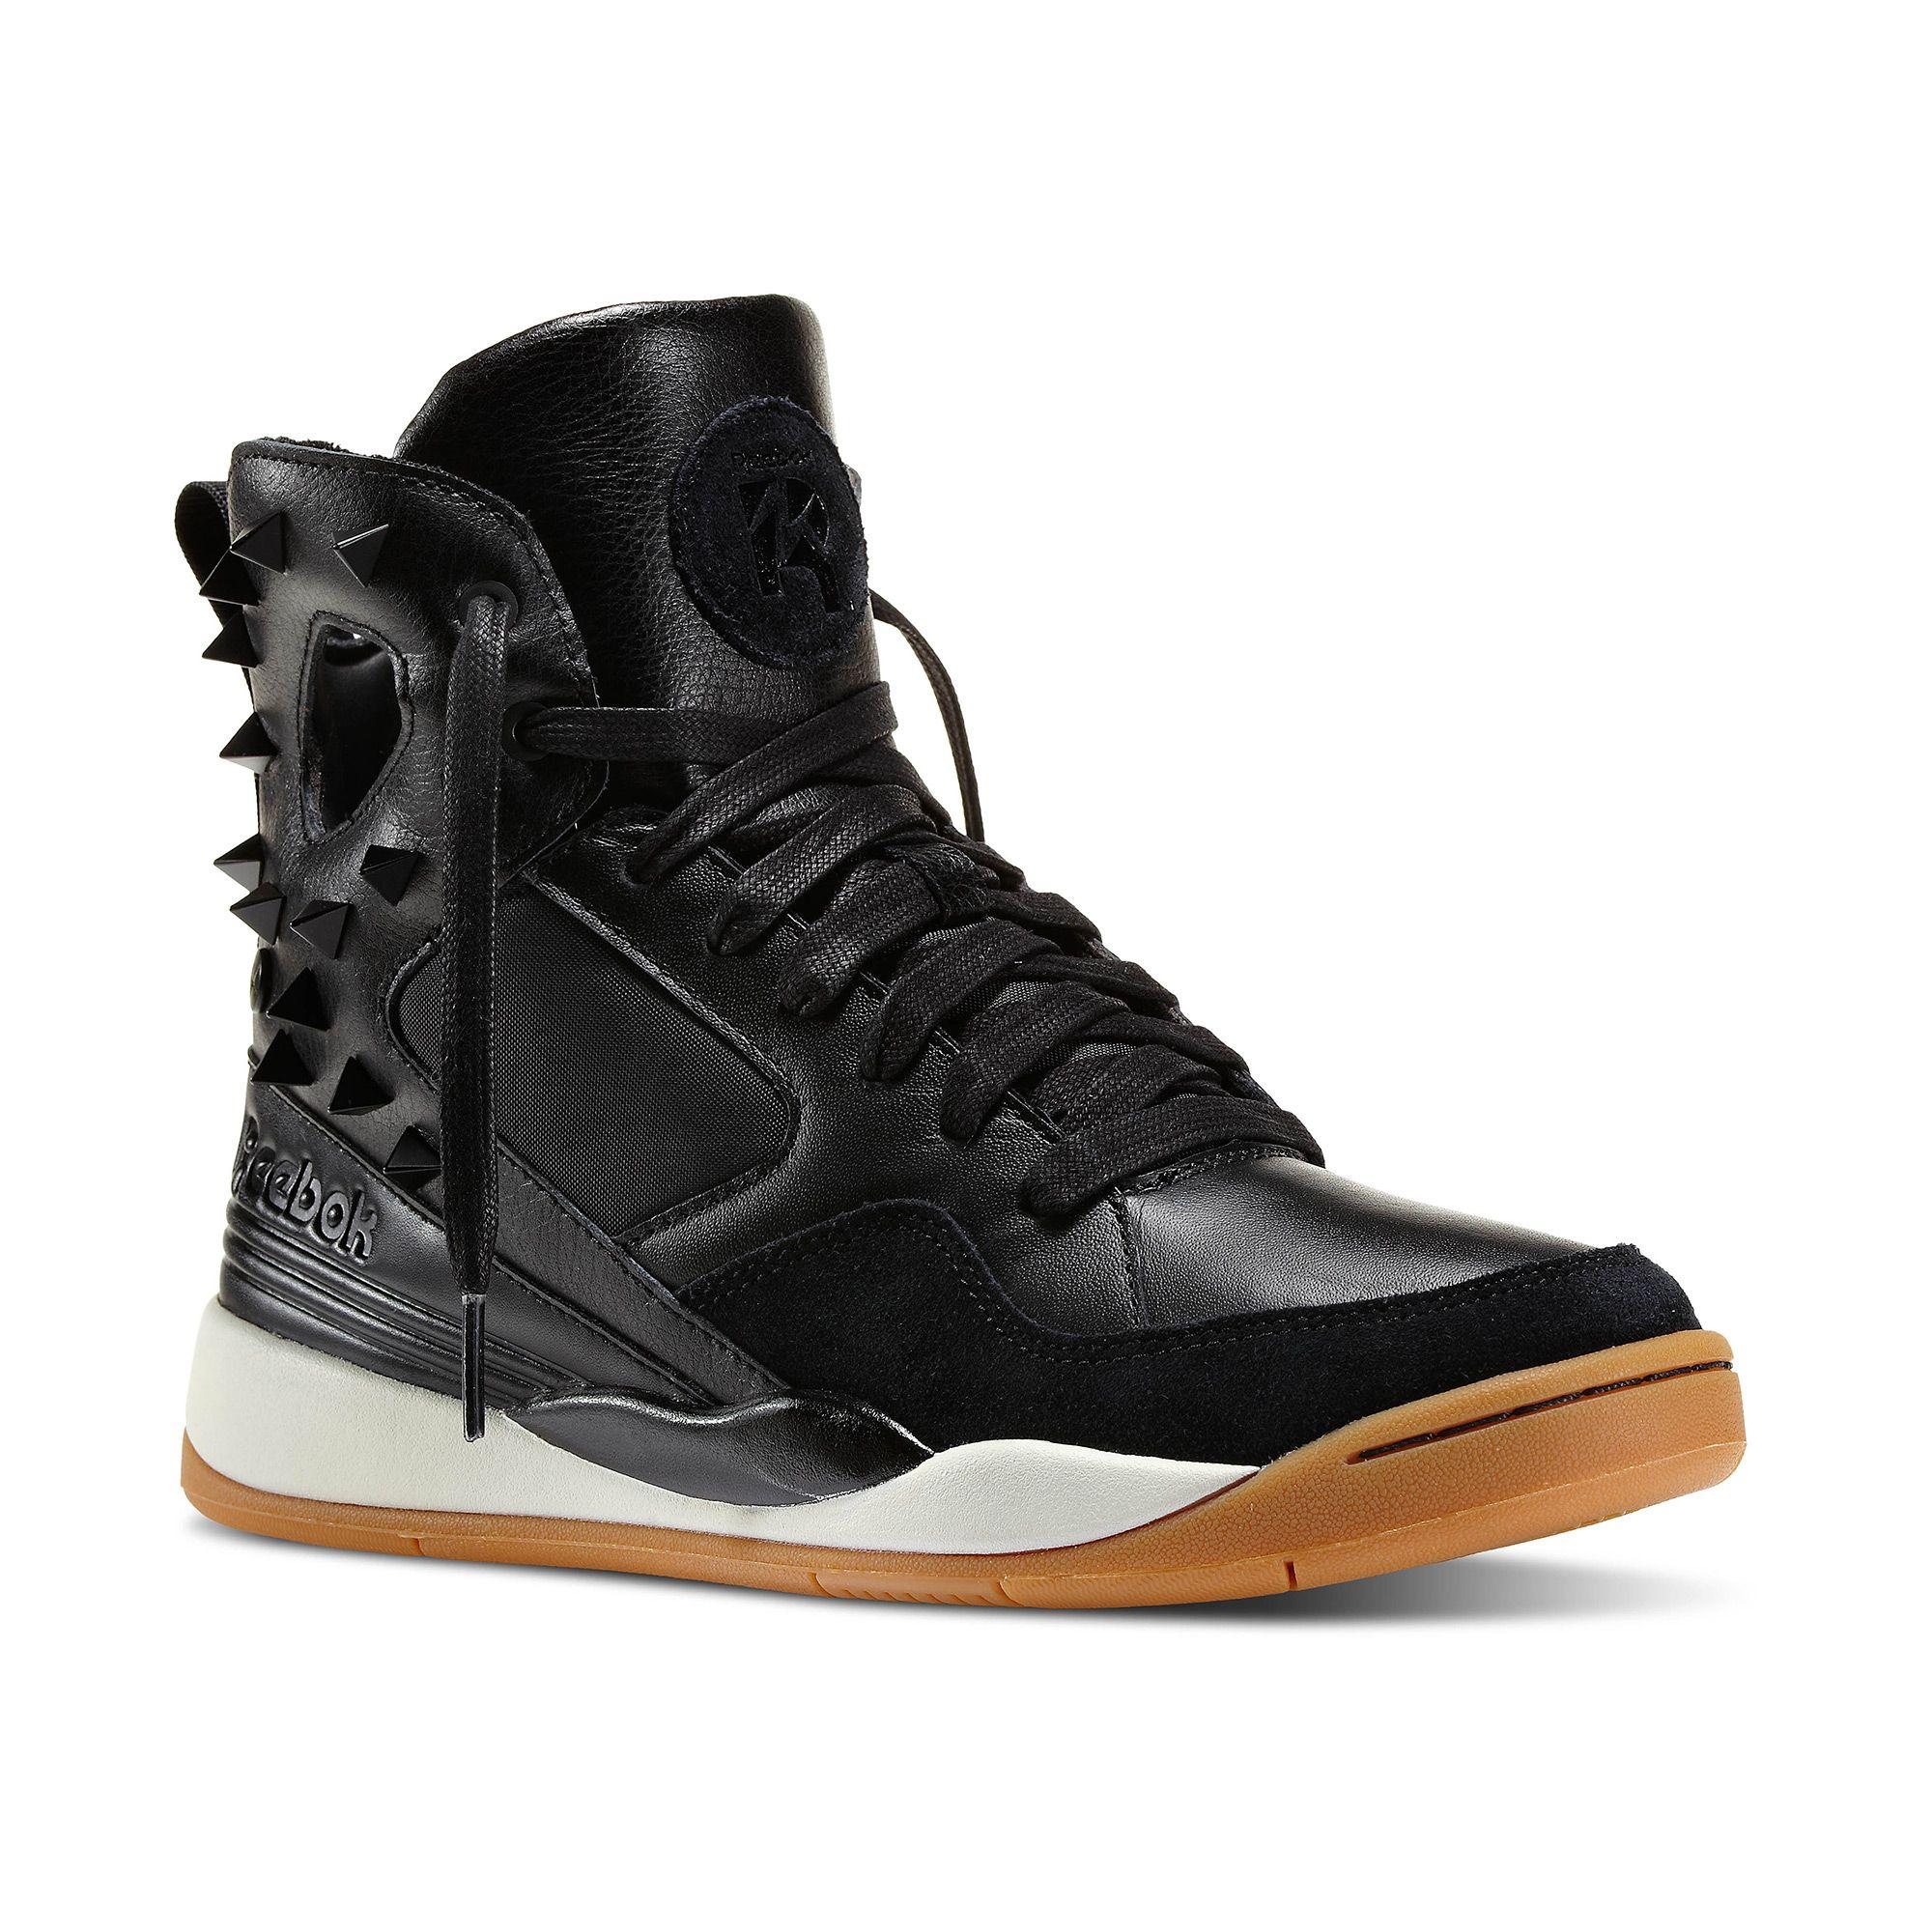 Reebok's Alicia Keys Court | My style | Reebok, Court shoes